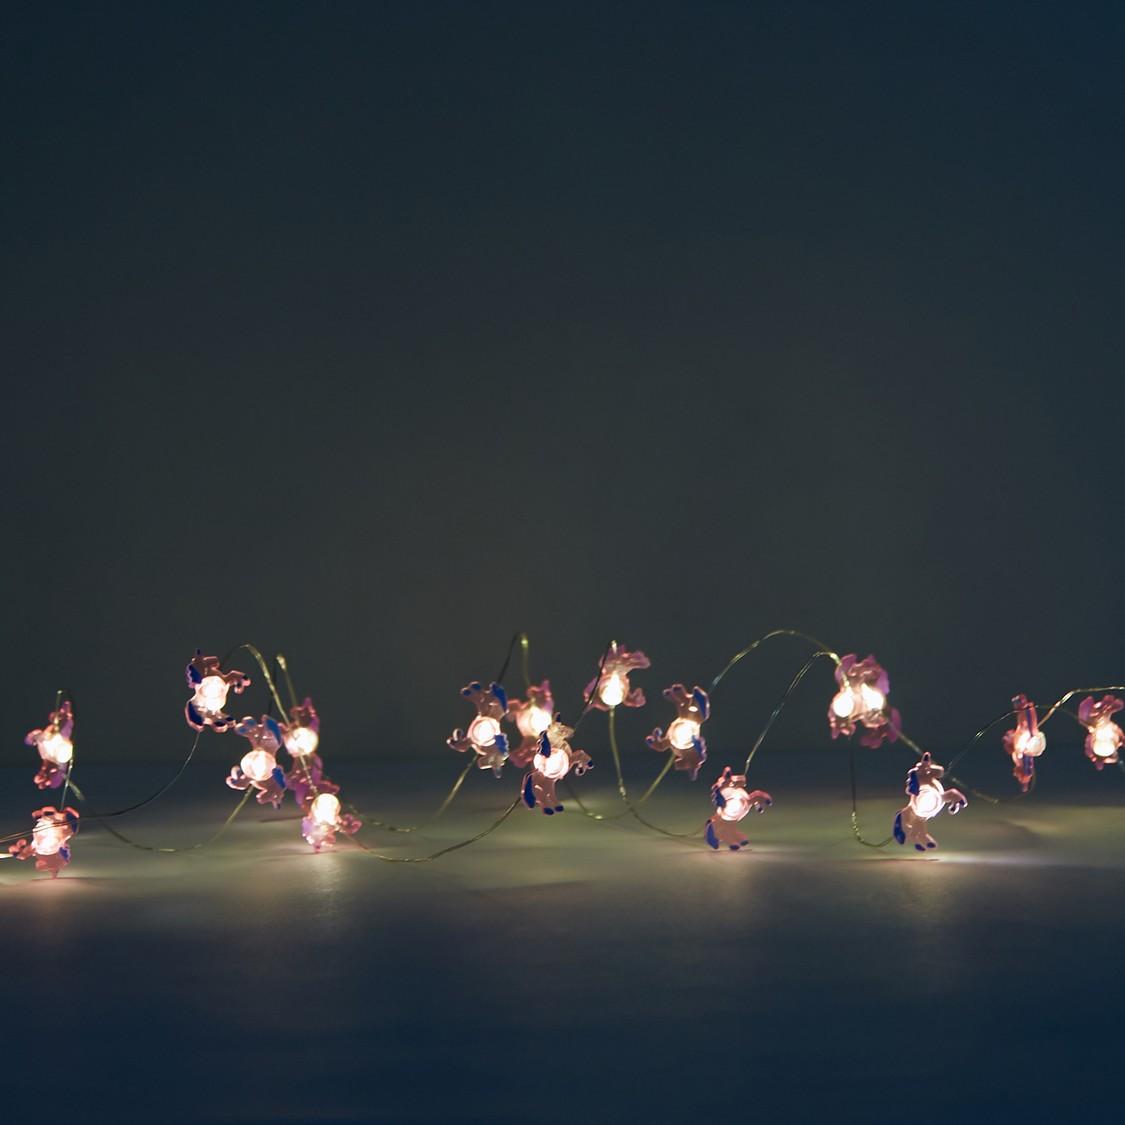 Decorative Unicorn LED String Lights